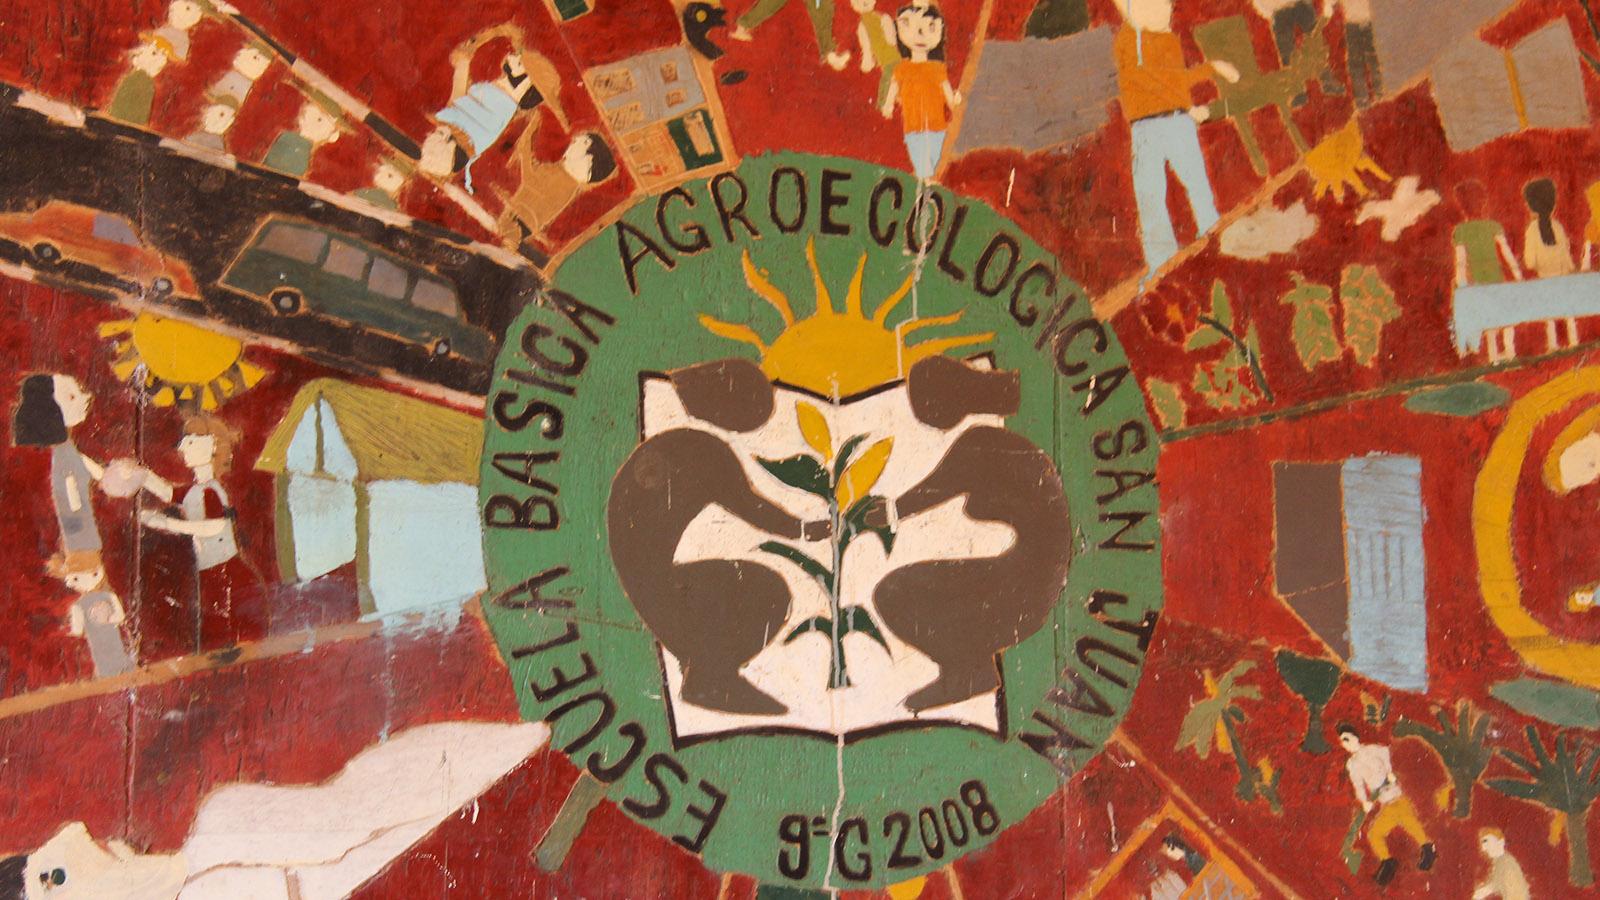 Projekt_Paraguay_Landwirtschaftsschule_Teaserbild_Sliderformat_00